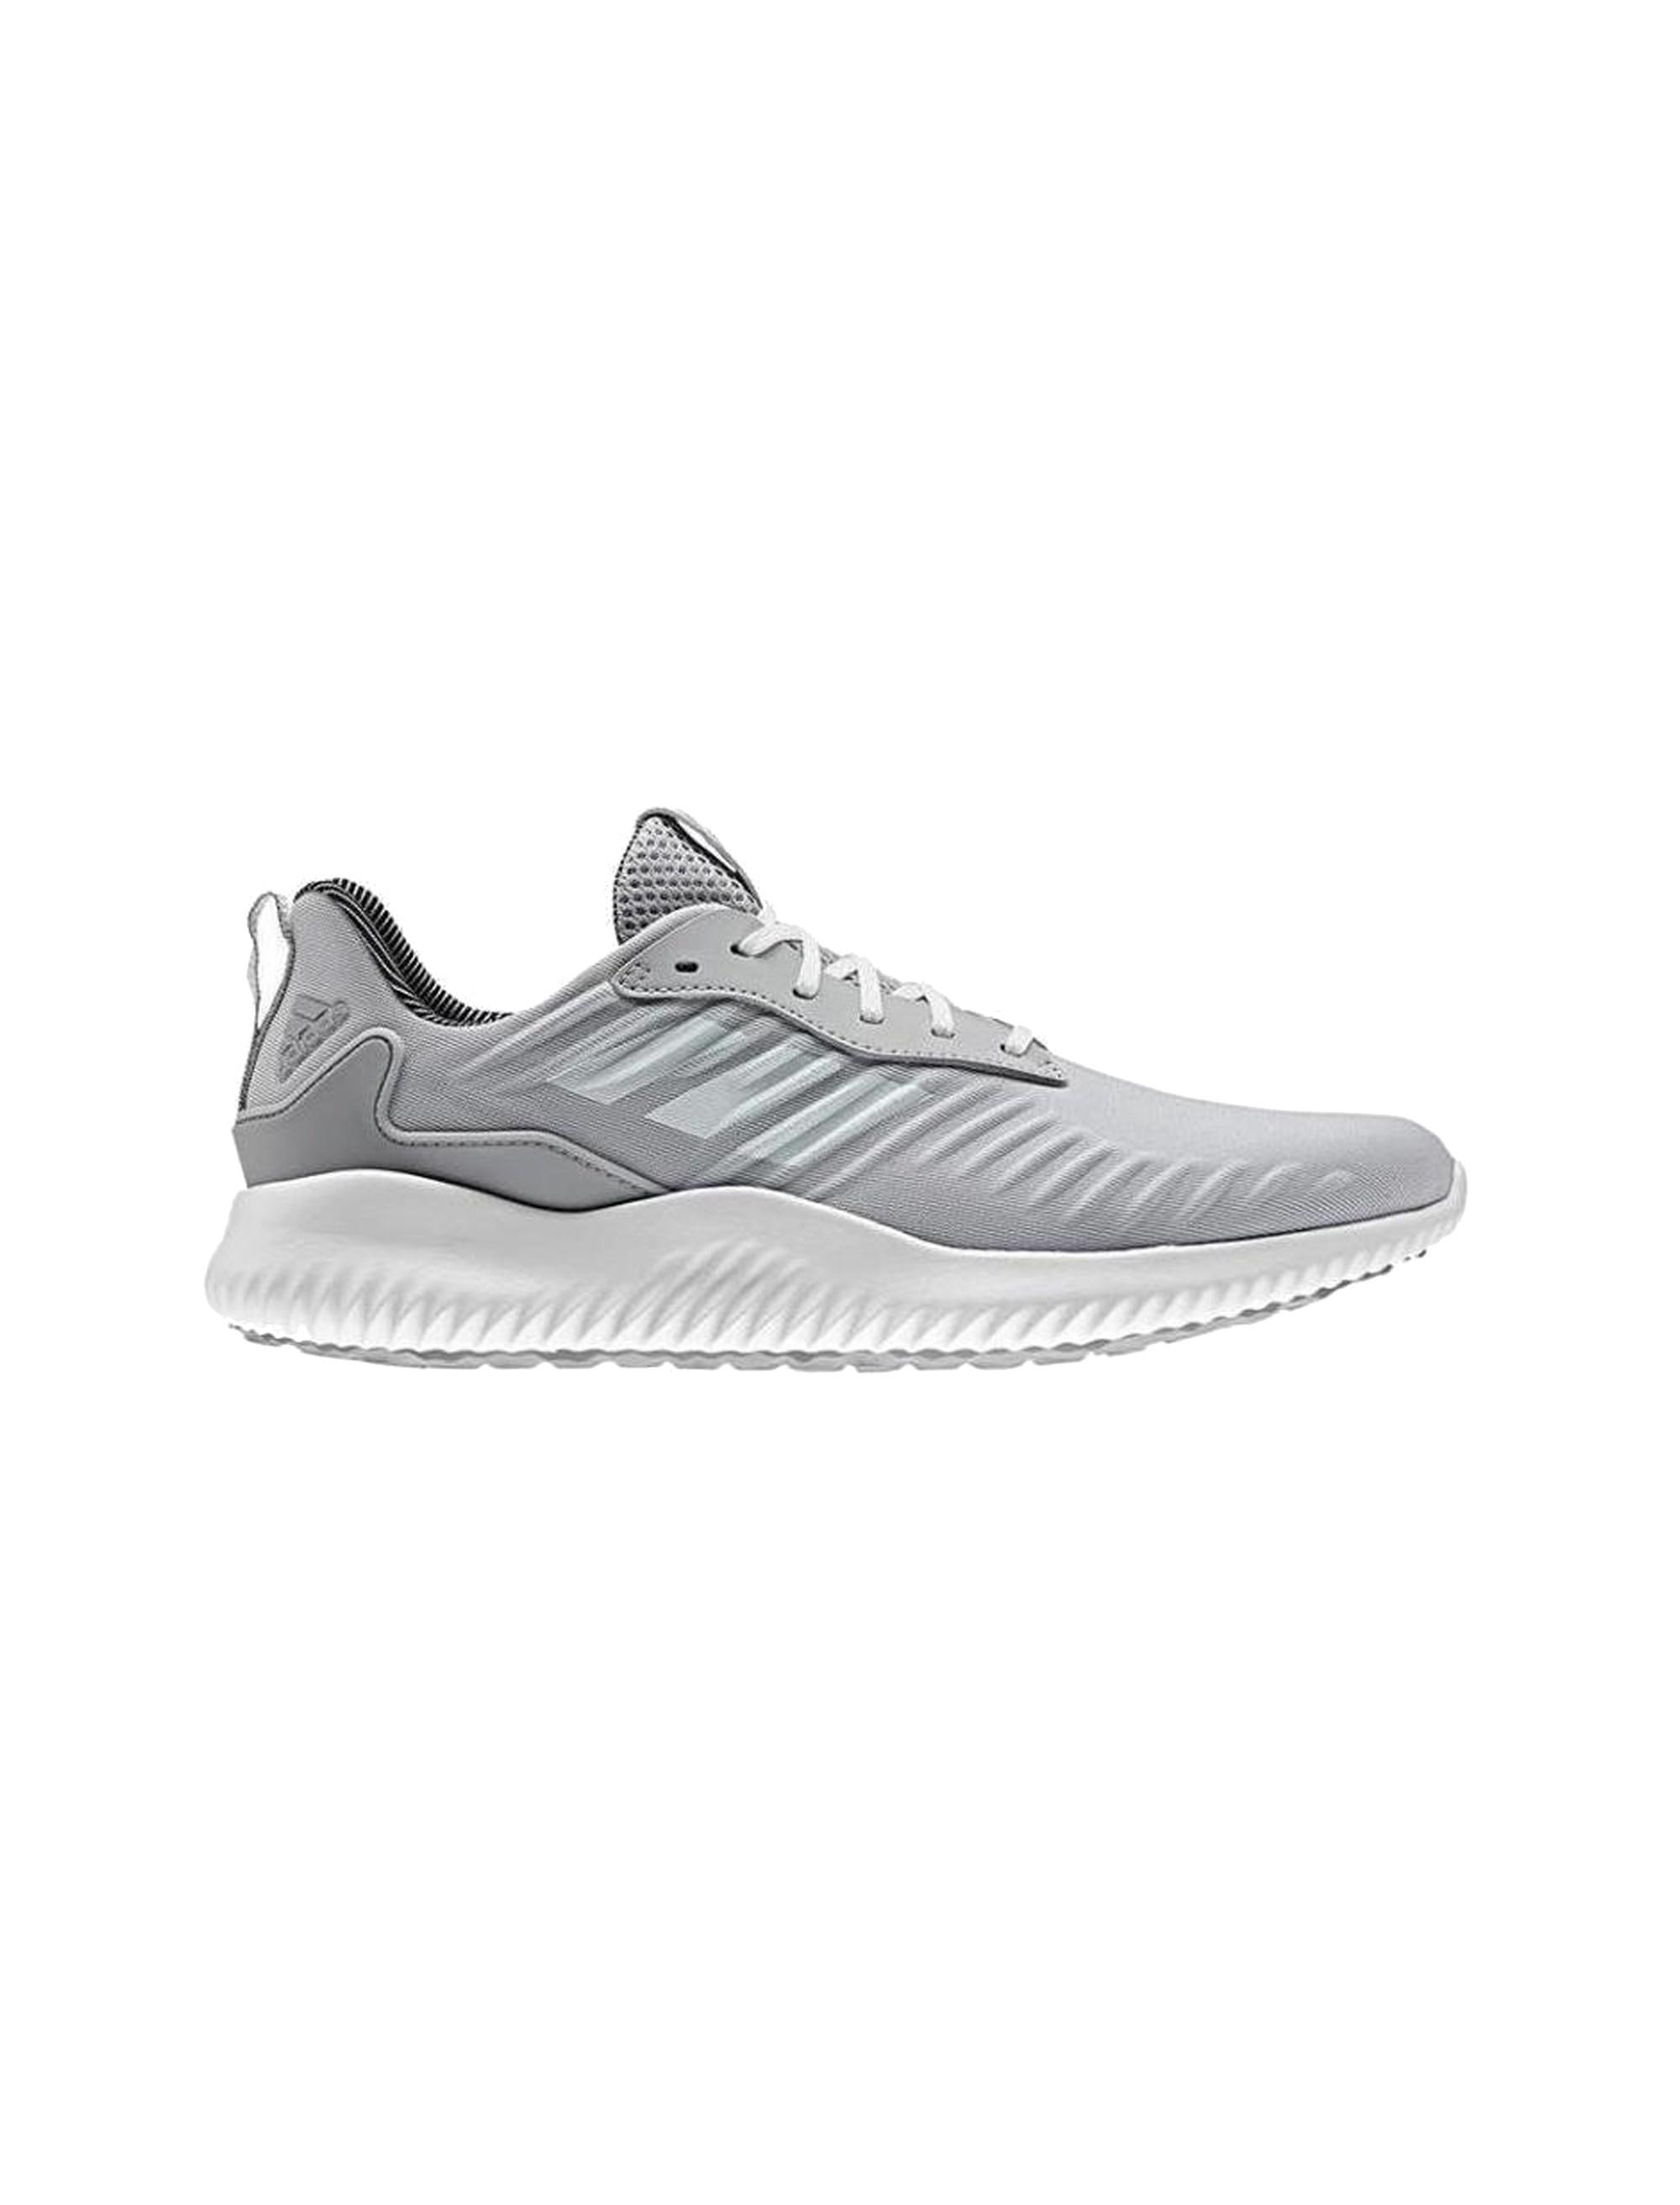 کفش دویدن بندی مردانه Alphabounce RC - آدیداس